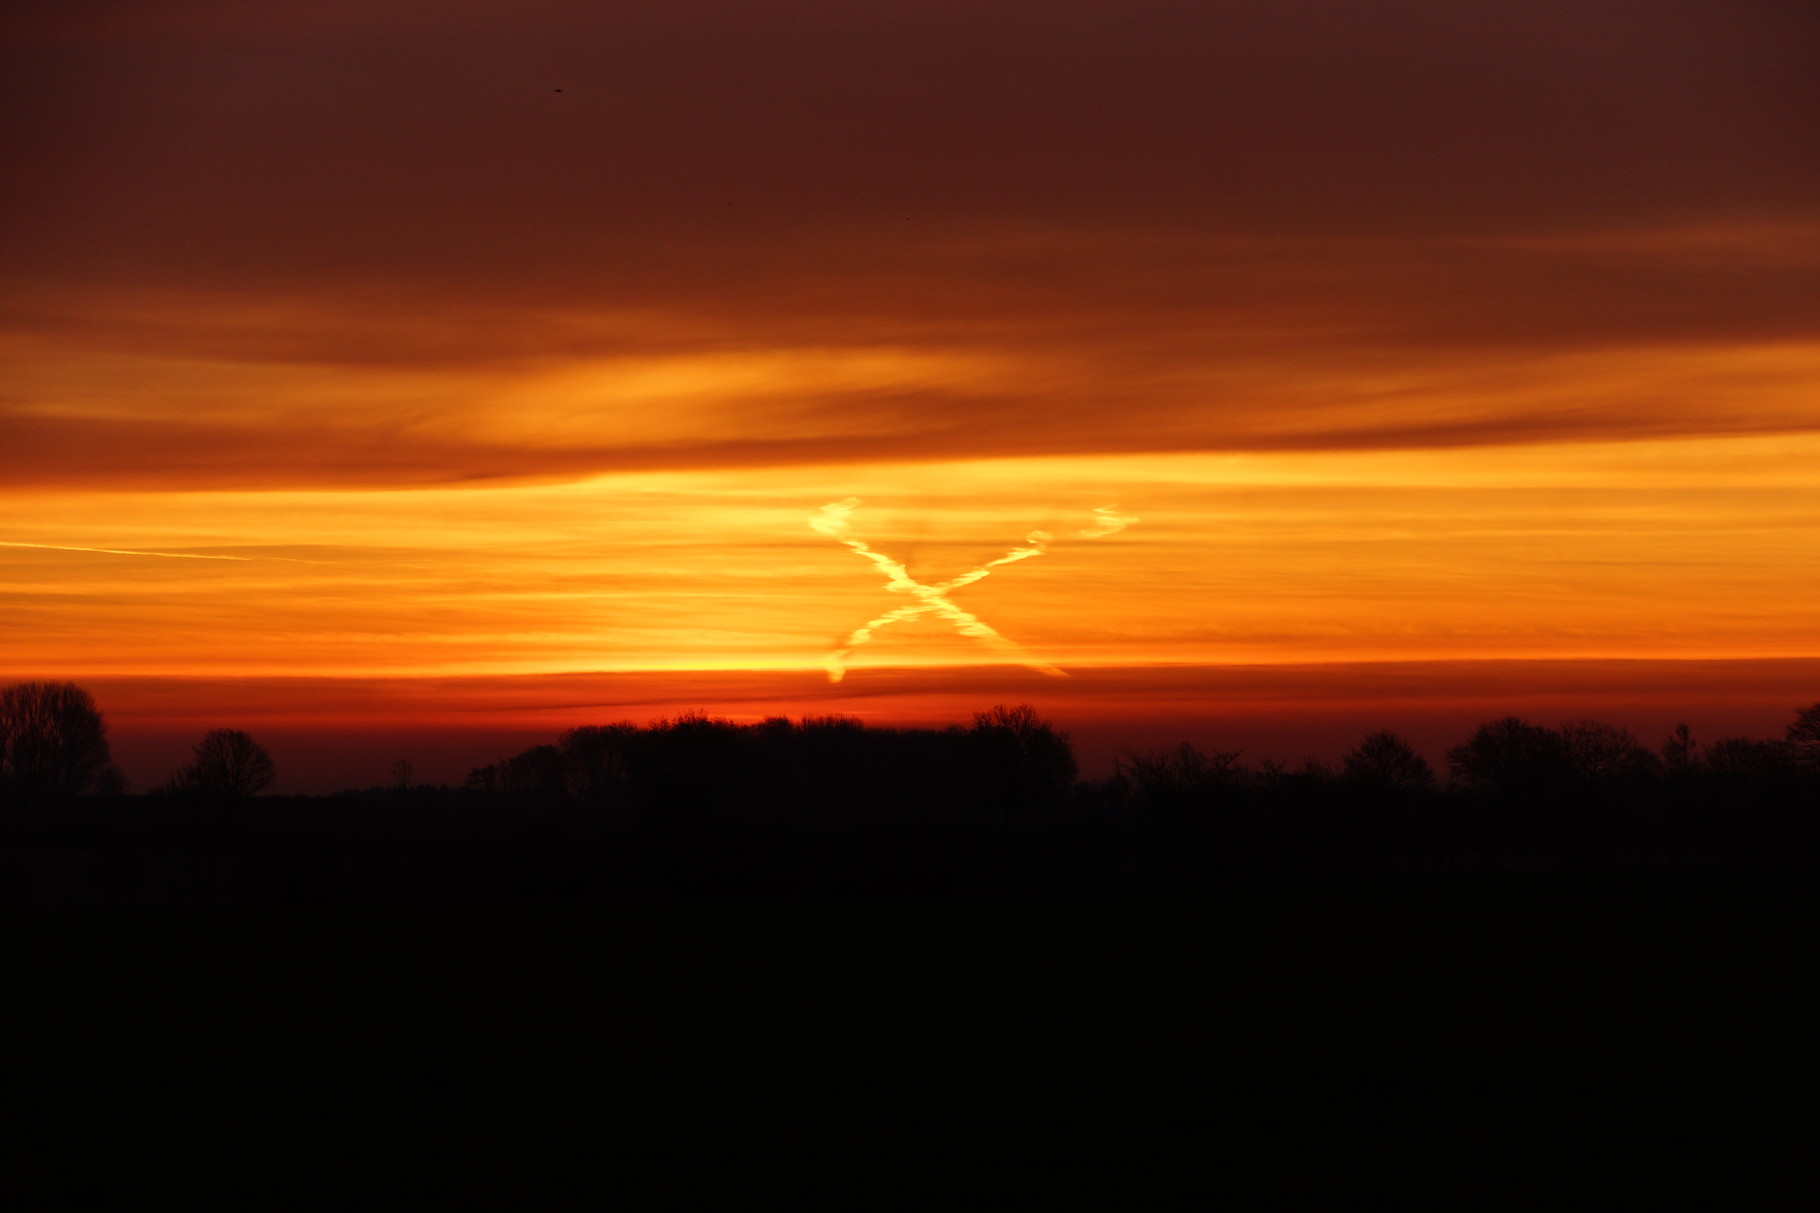 Der Sonnenaufgang am Ostersonntag.